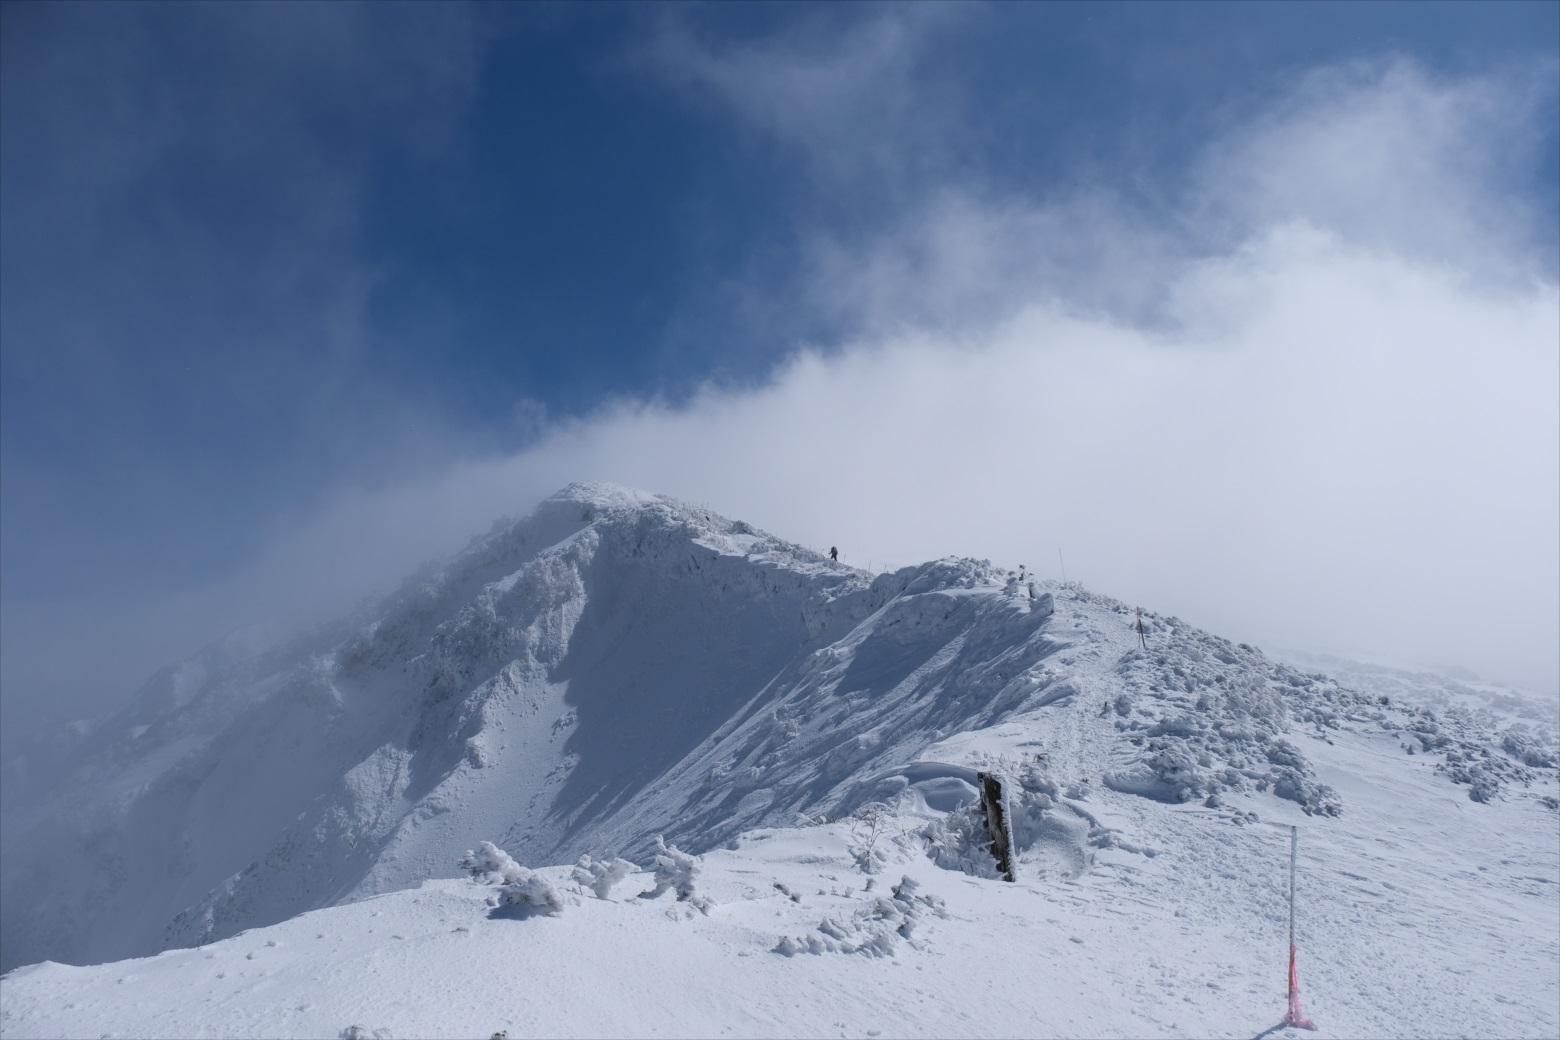 【残雪期・雪山登山】伯耆大山~鳥取の誇る独立峰~